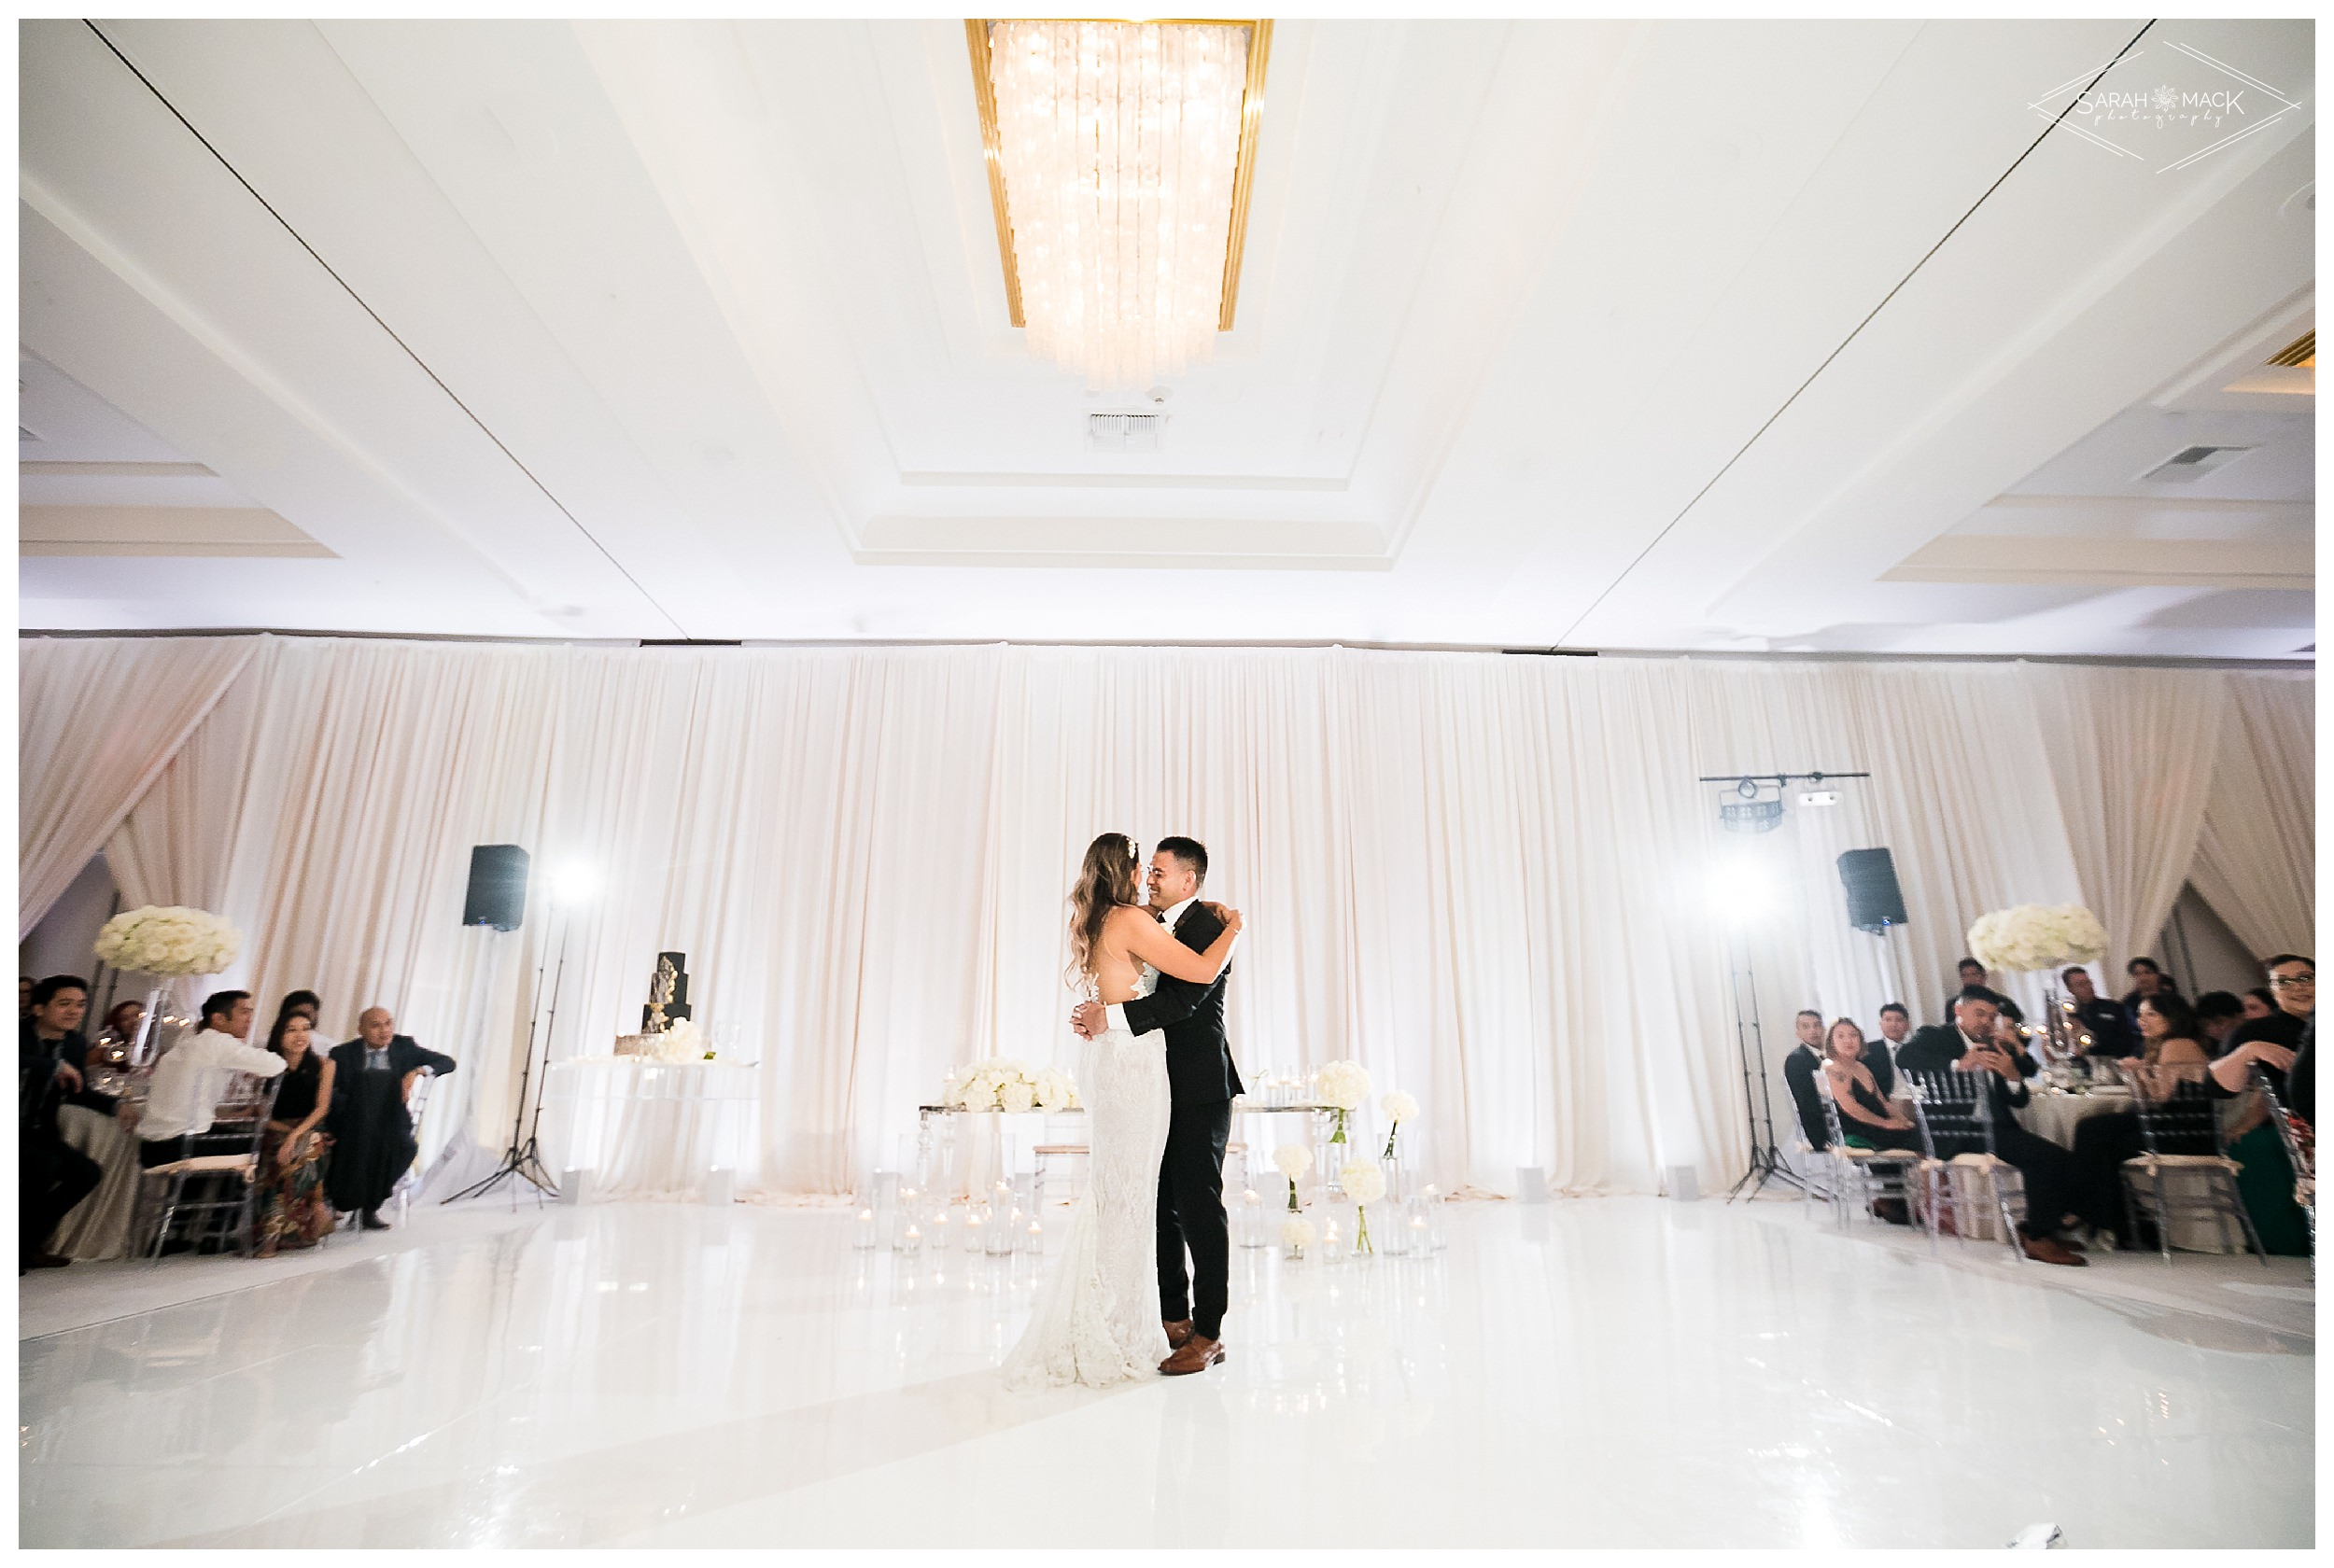 LE-Avenue-of-the-Arts-Costa-Mesa-Wedding-Photography-0185.jpg